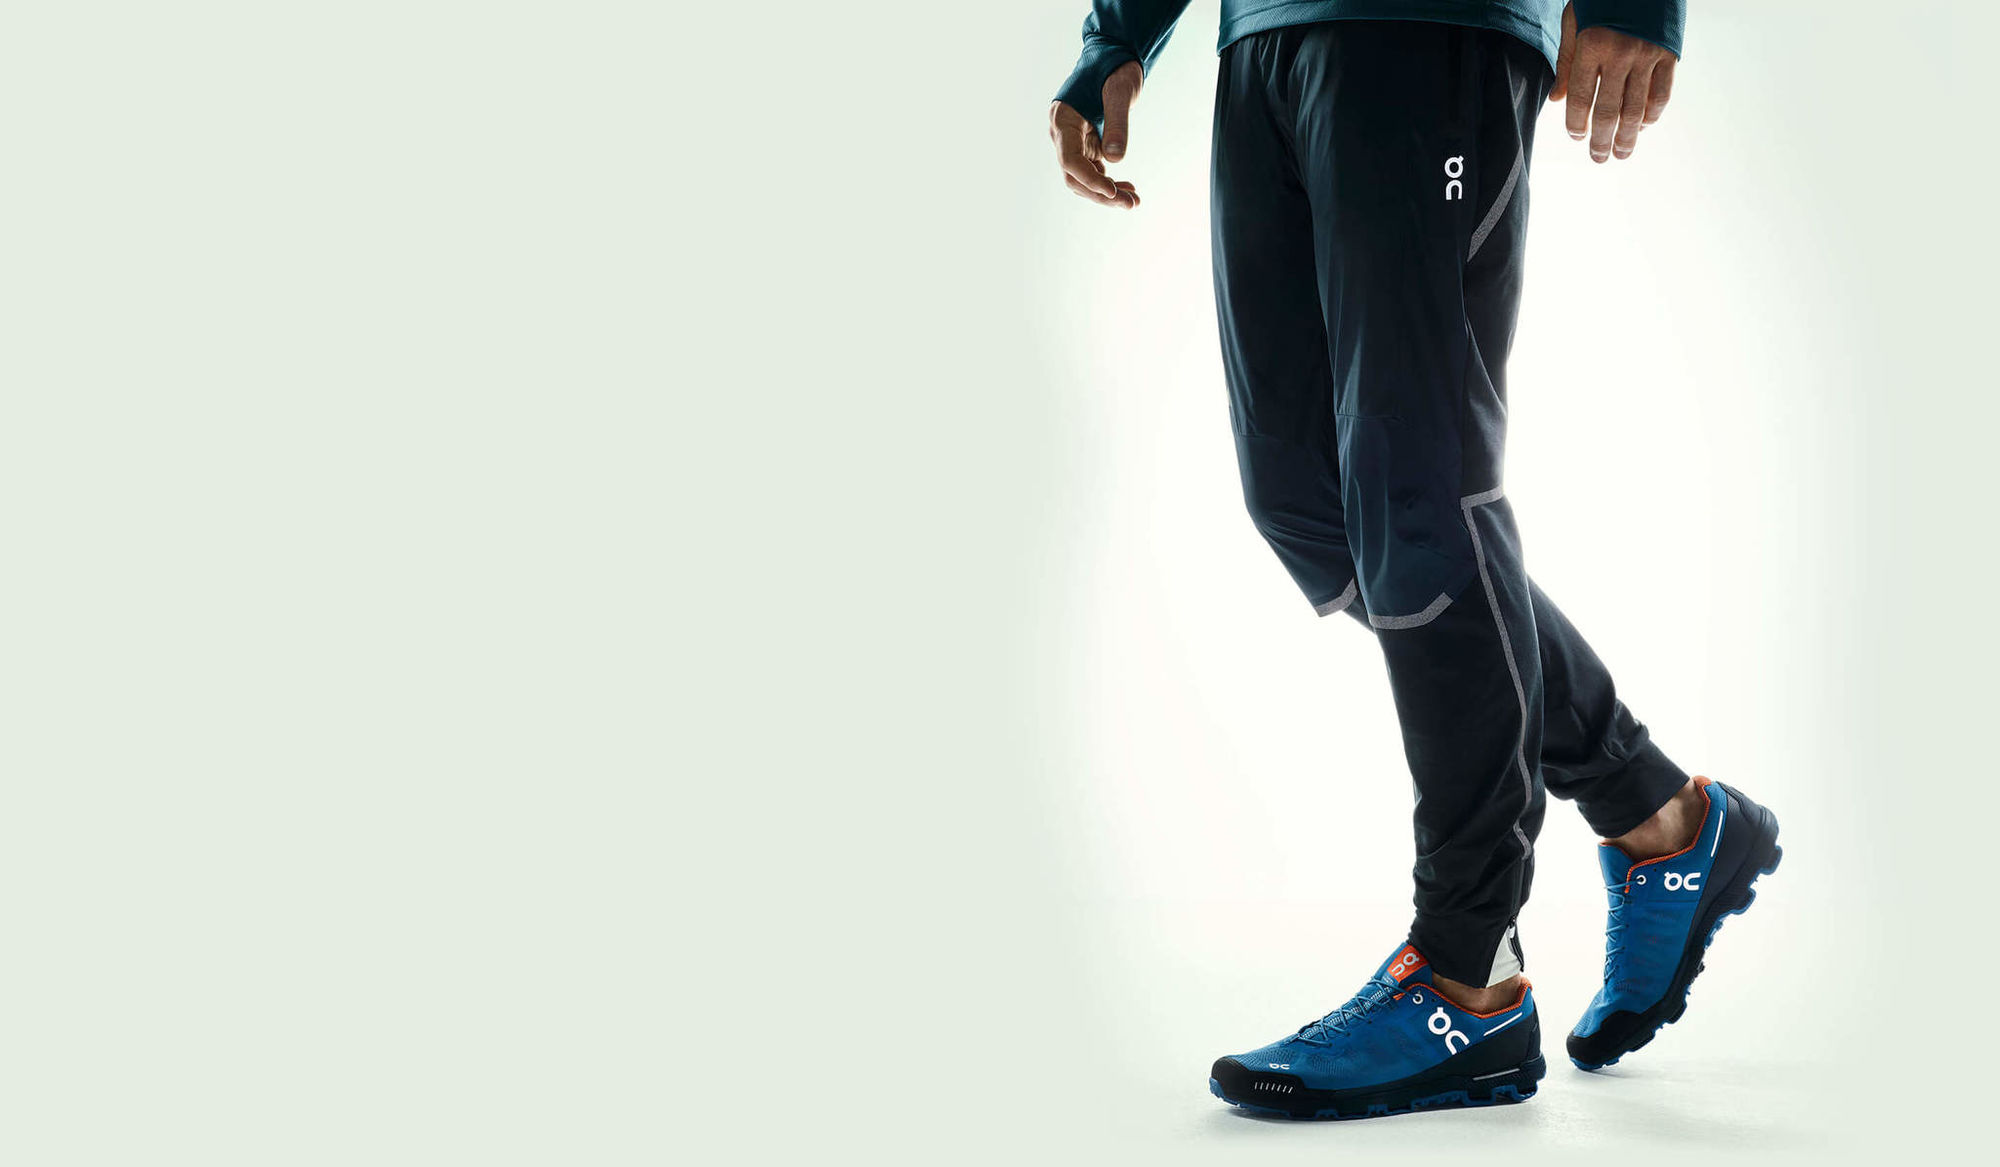 On Running Pants in Blau Schwarz